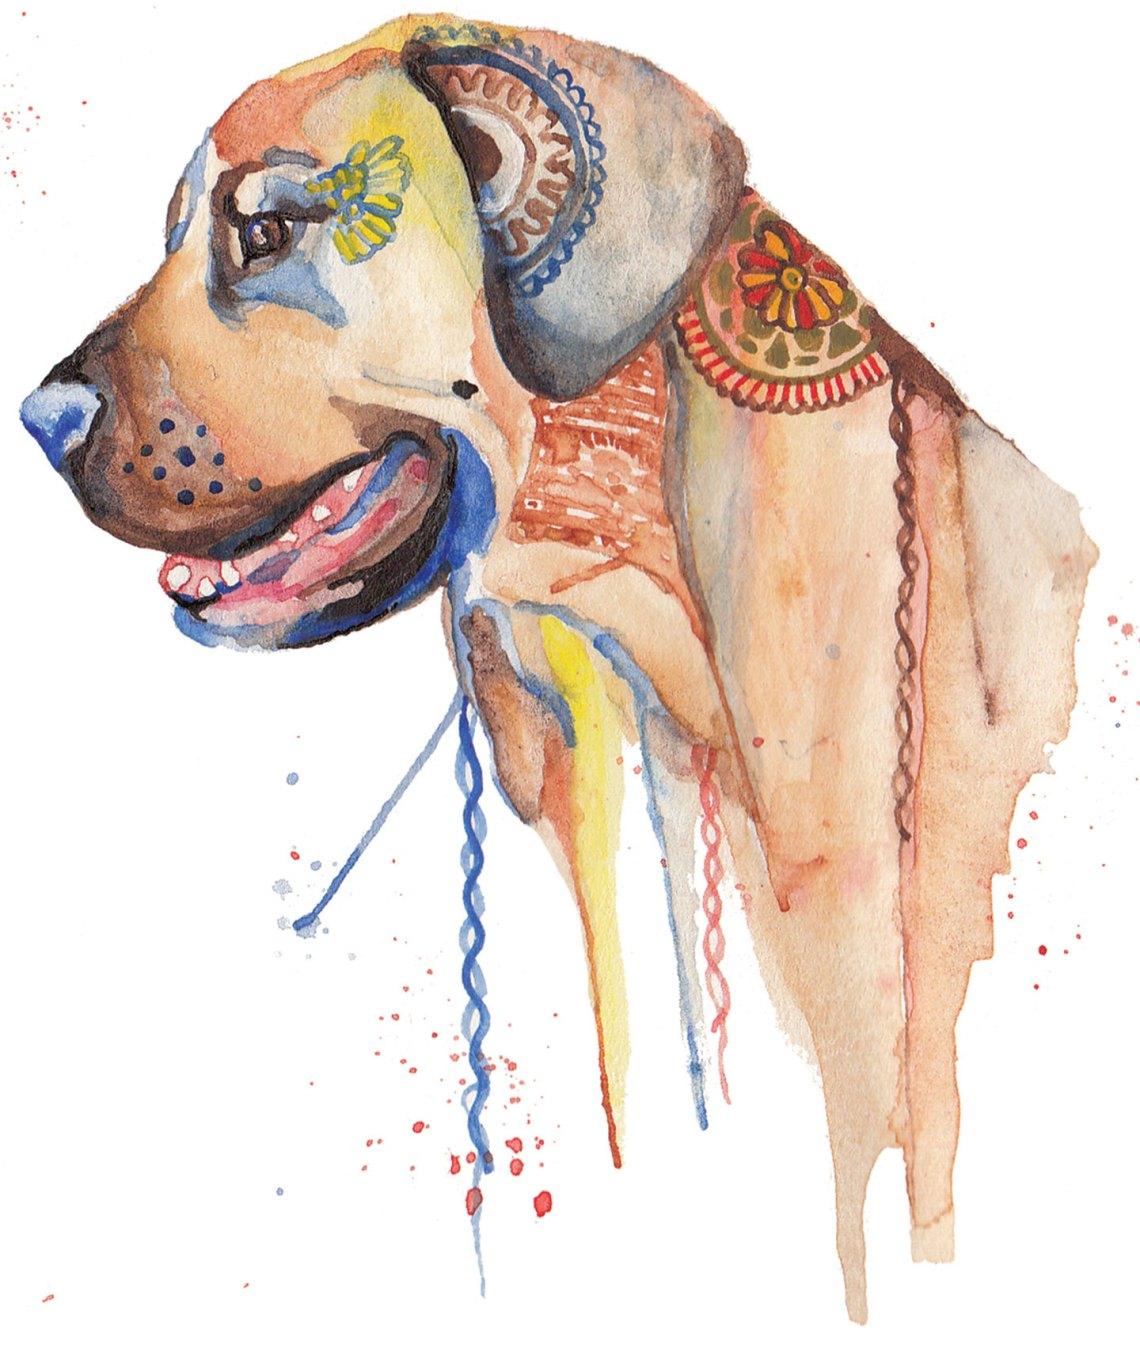 Watercolor Dog | The Postman's Knock